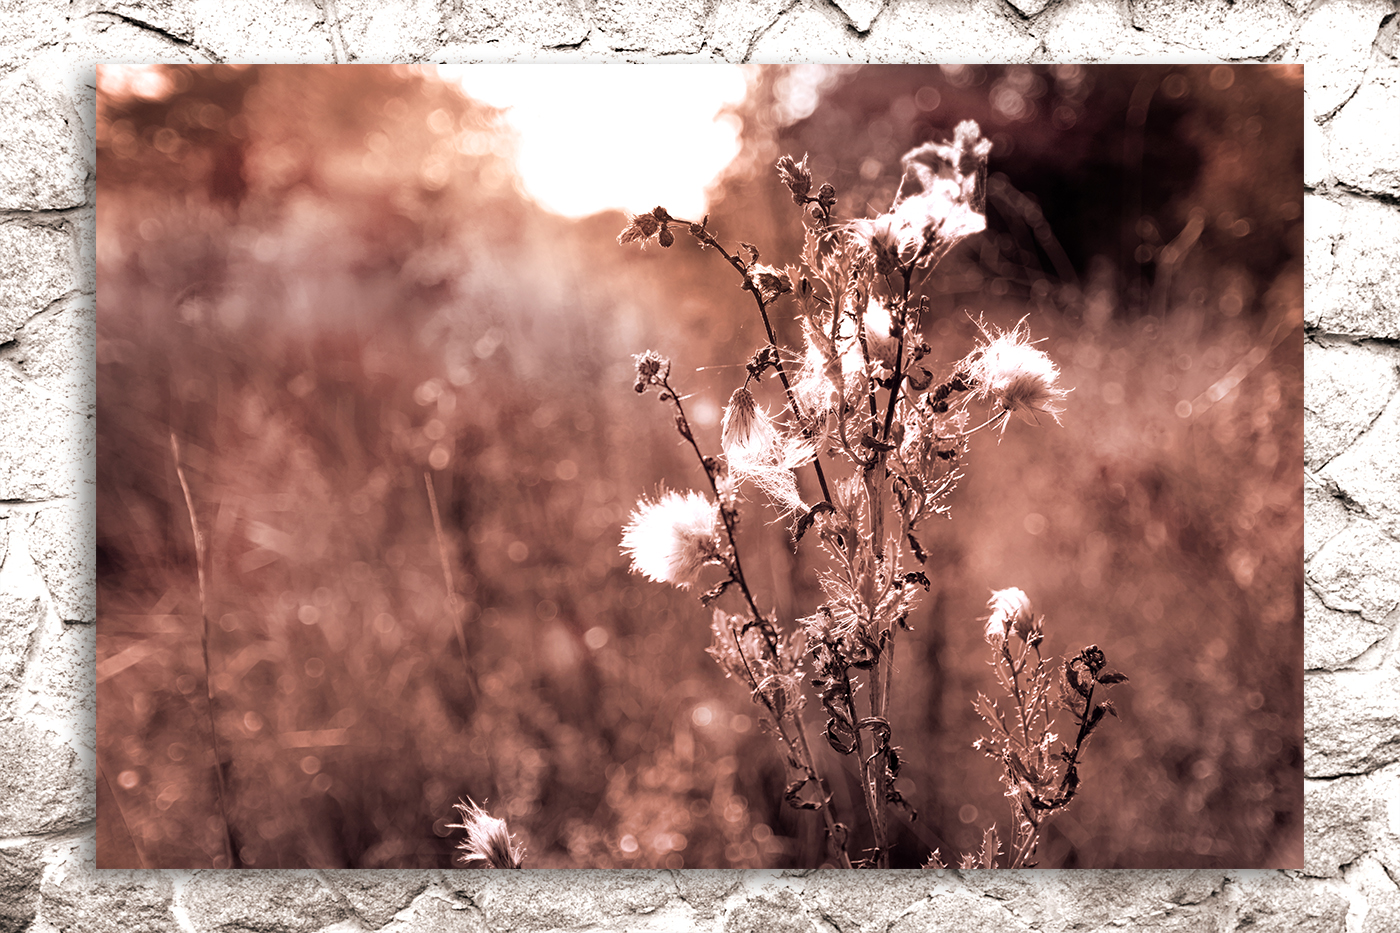 Nature photo, landscape photo, floral photo, flora photo example image 3